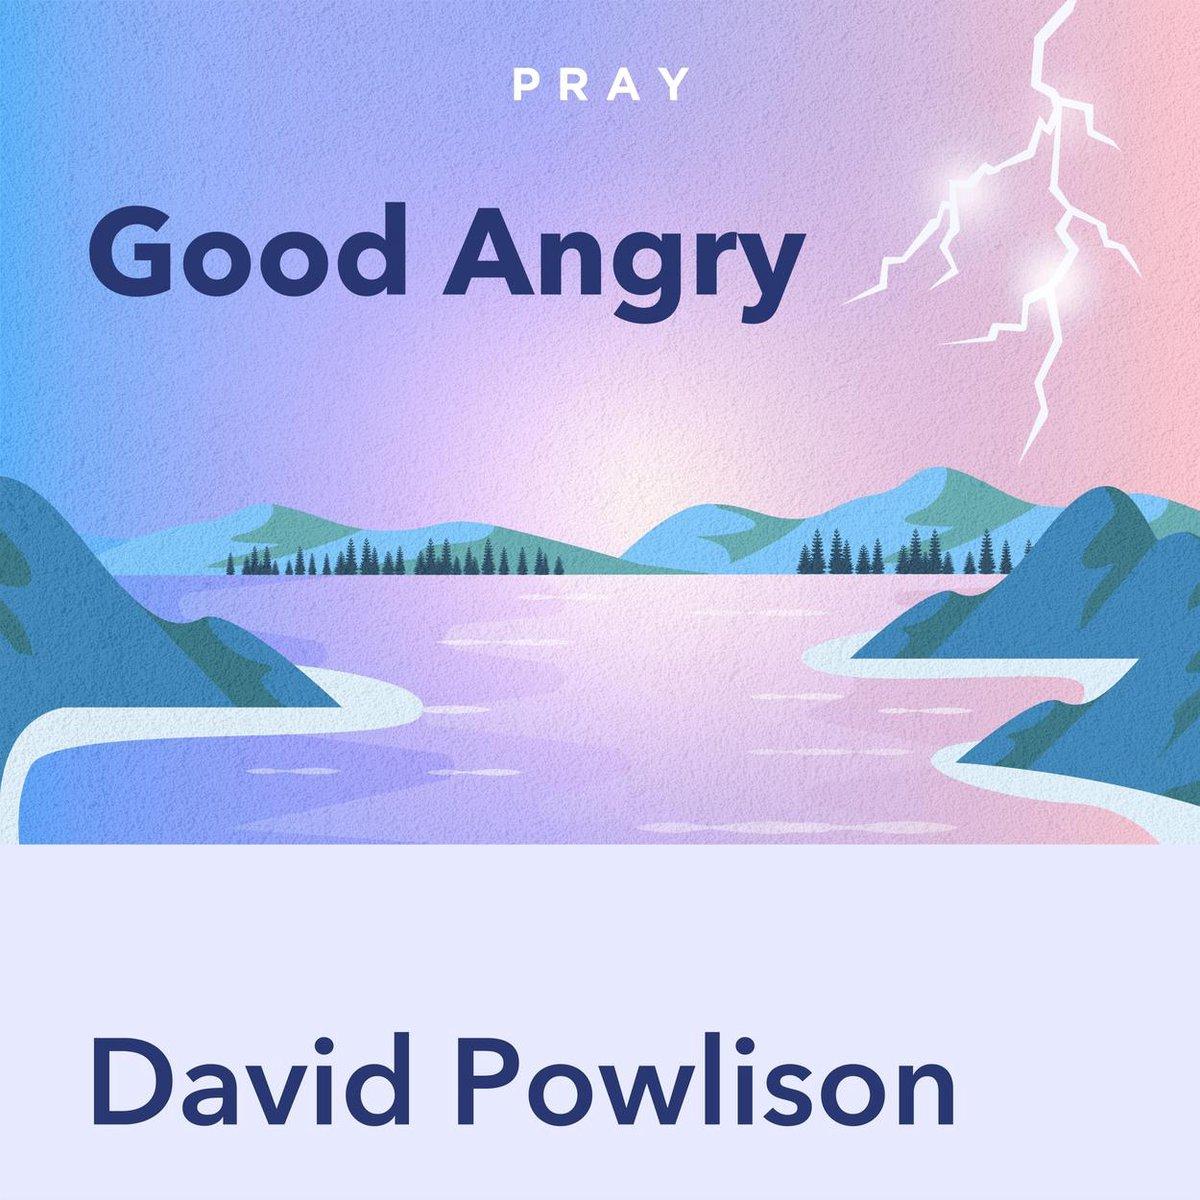 Pray.com Summary of Good Angry, by David Powlison